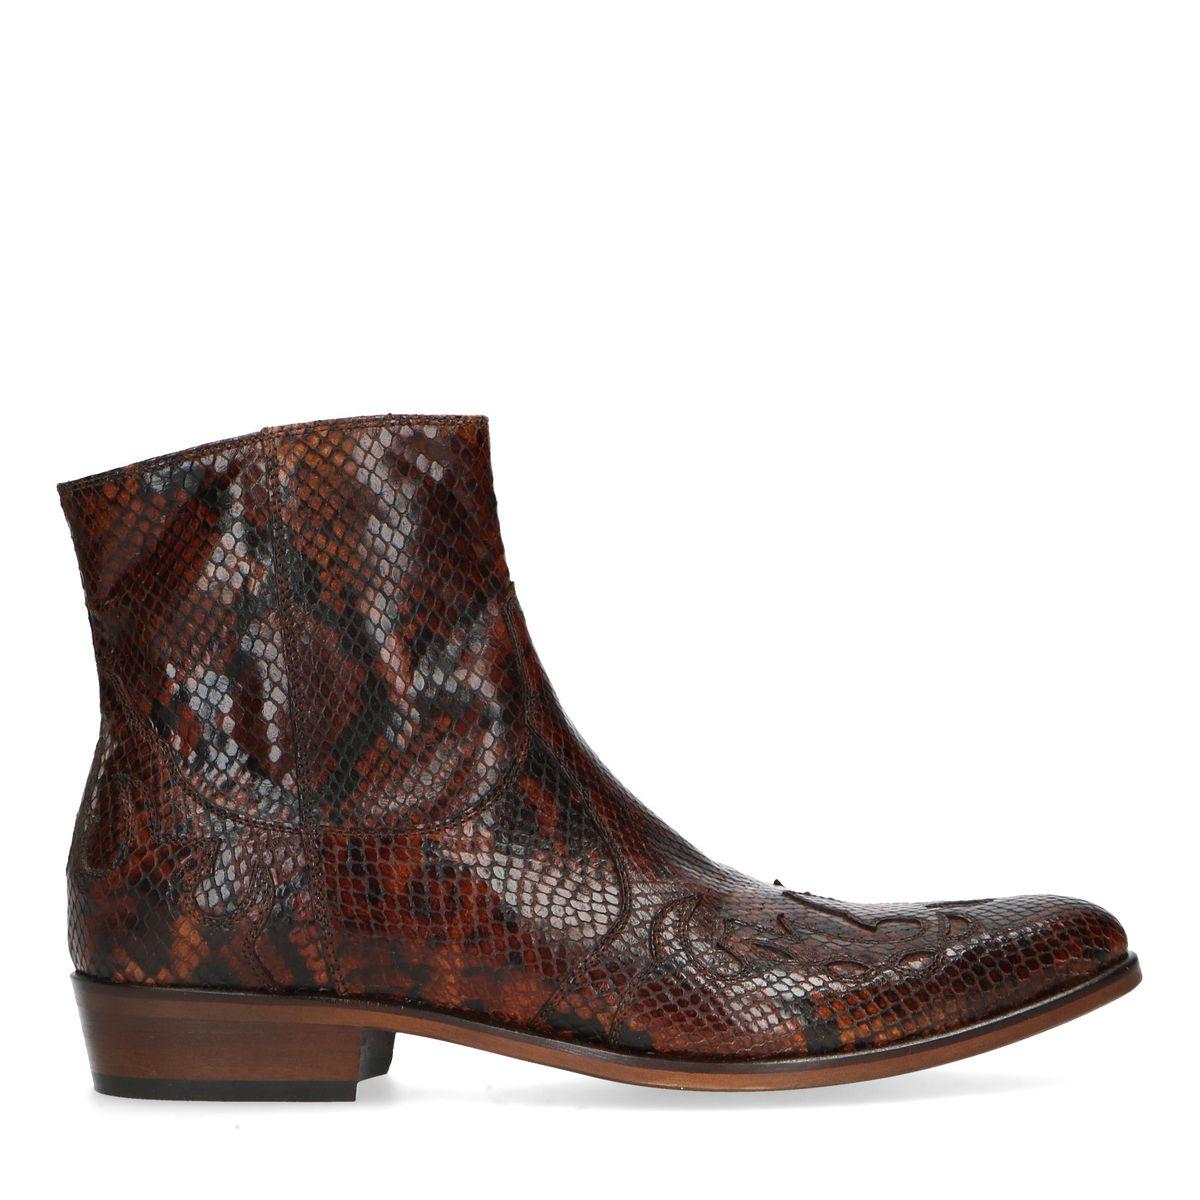 Santiags en cuir avec imprimé serpent - marron (Maat 42)